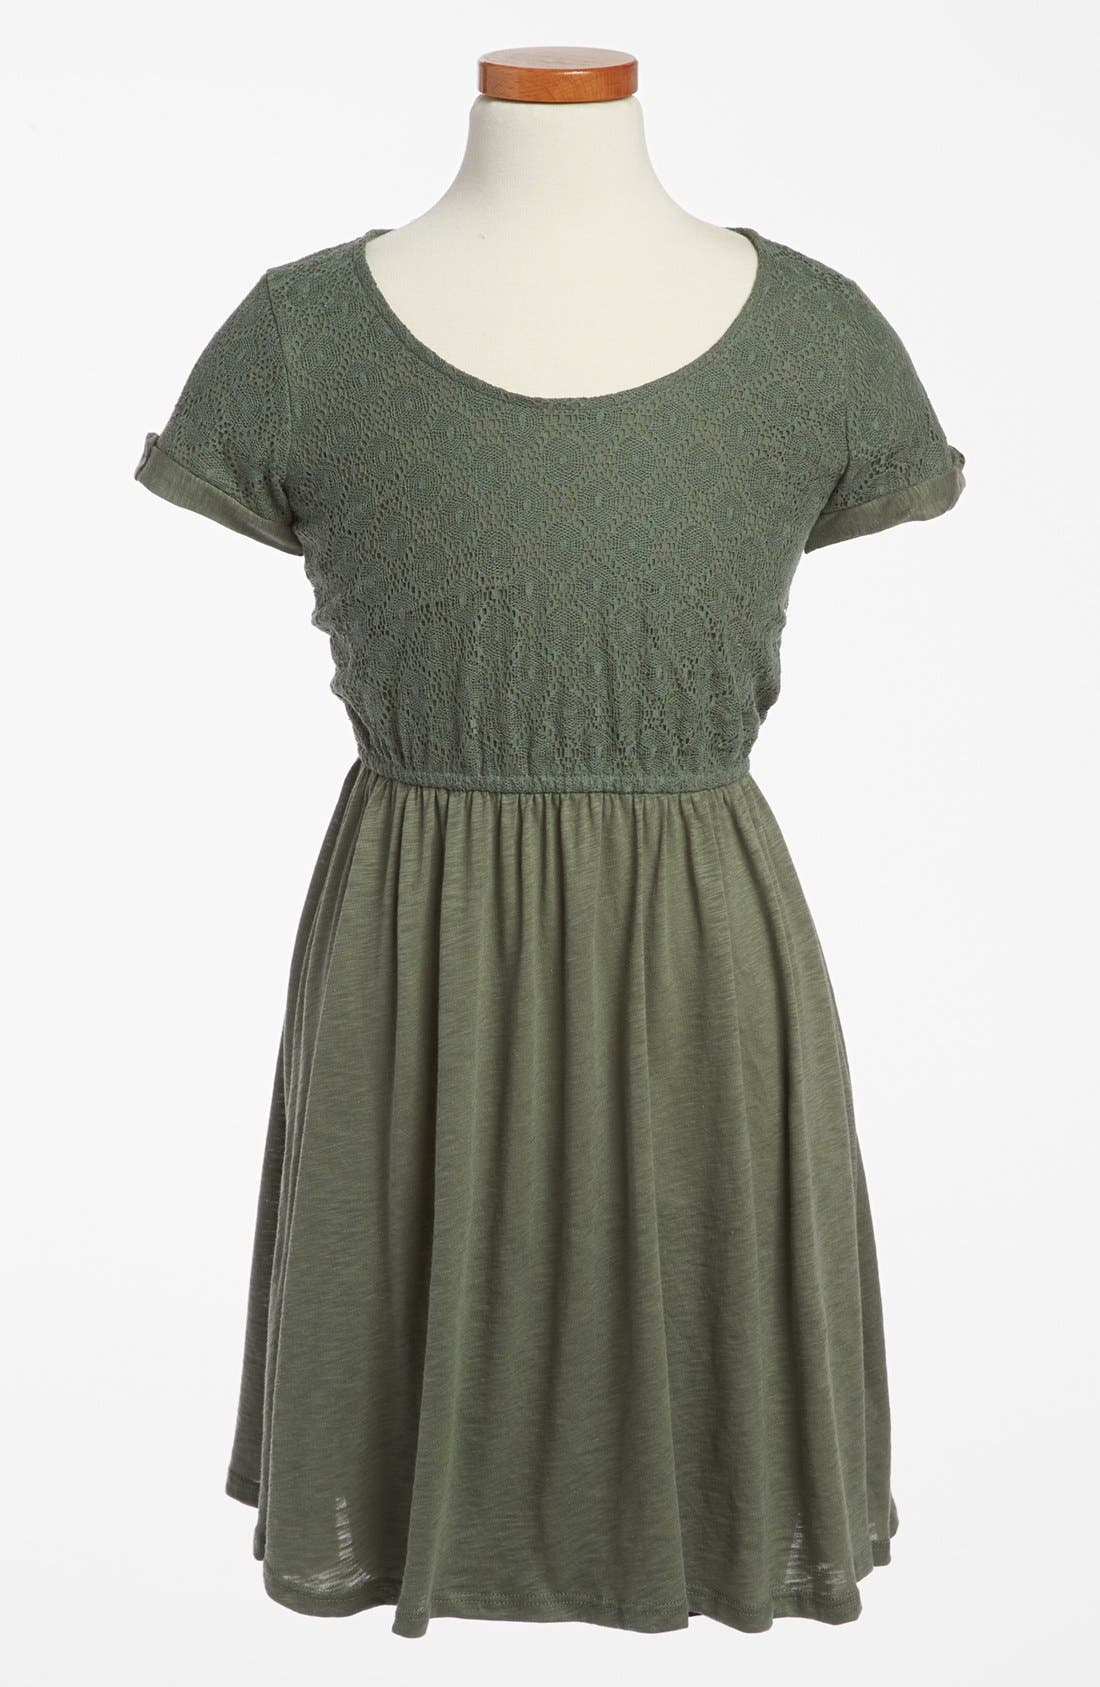 Alternate Image 1 Selected - Splendid Lace Dress (Big Girls)